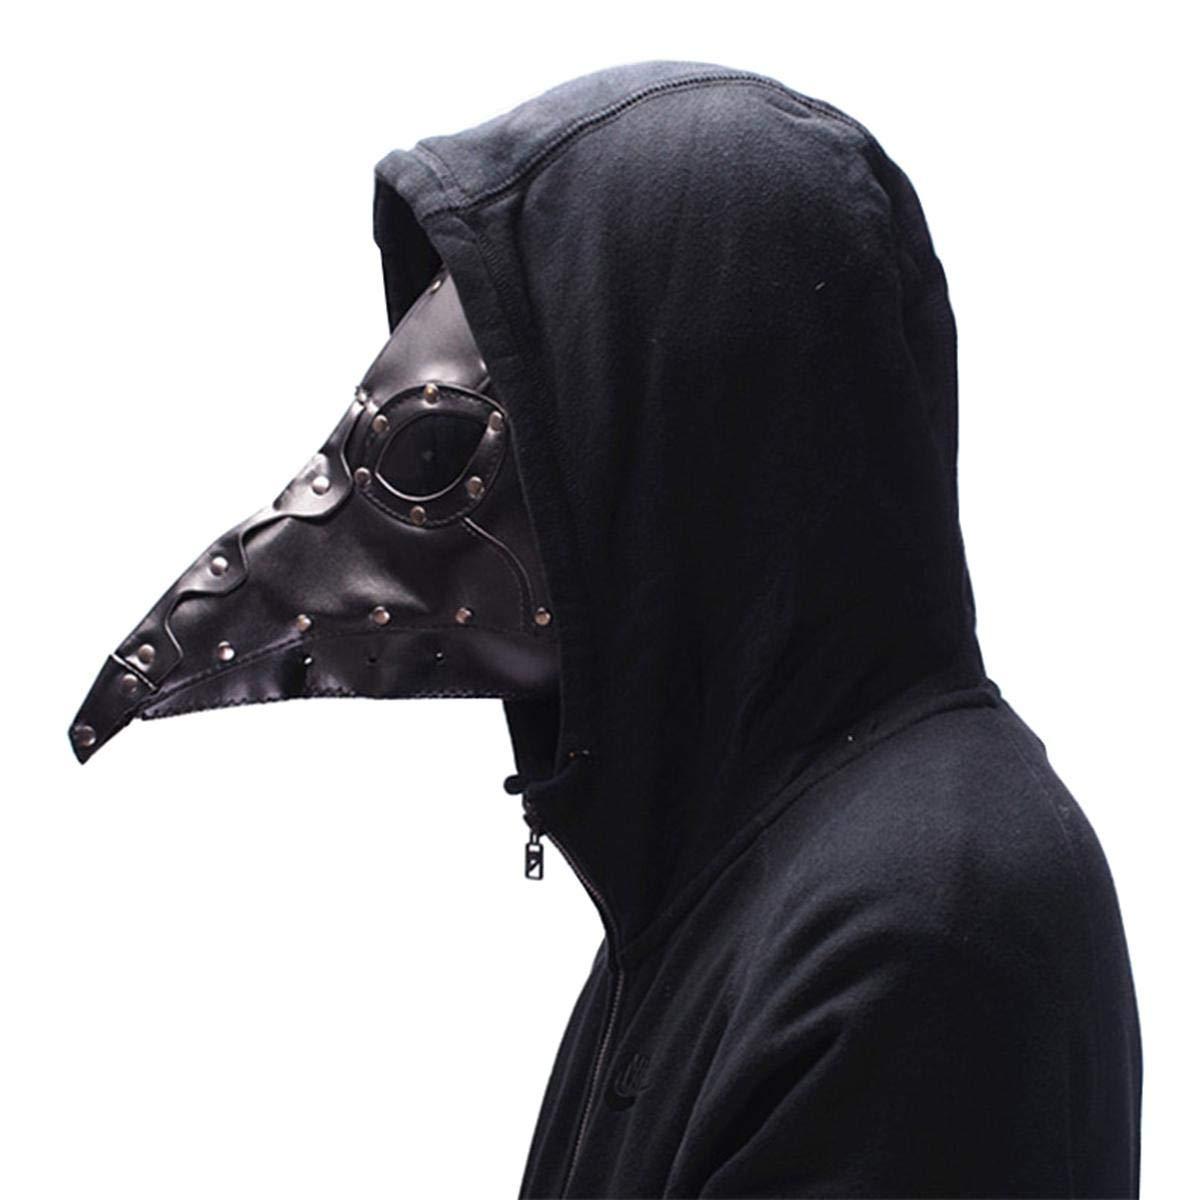 KOBWA Steampunk Plague Medici Mask, Retro Gotico Stile del Naso Lungo Becco Maschera Costume Cosplay Props Halloween in Maschera Maschera Intera White